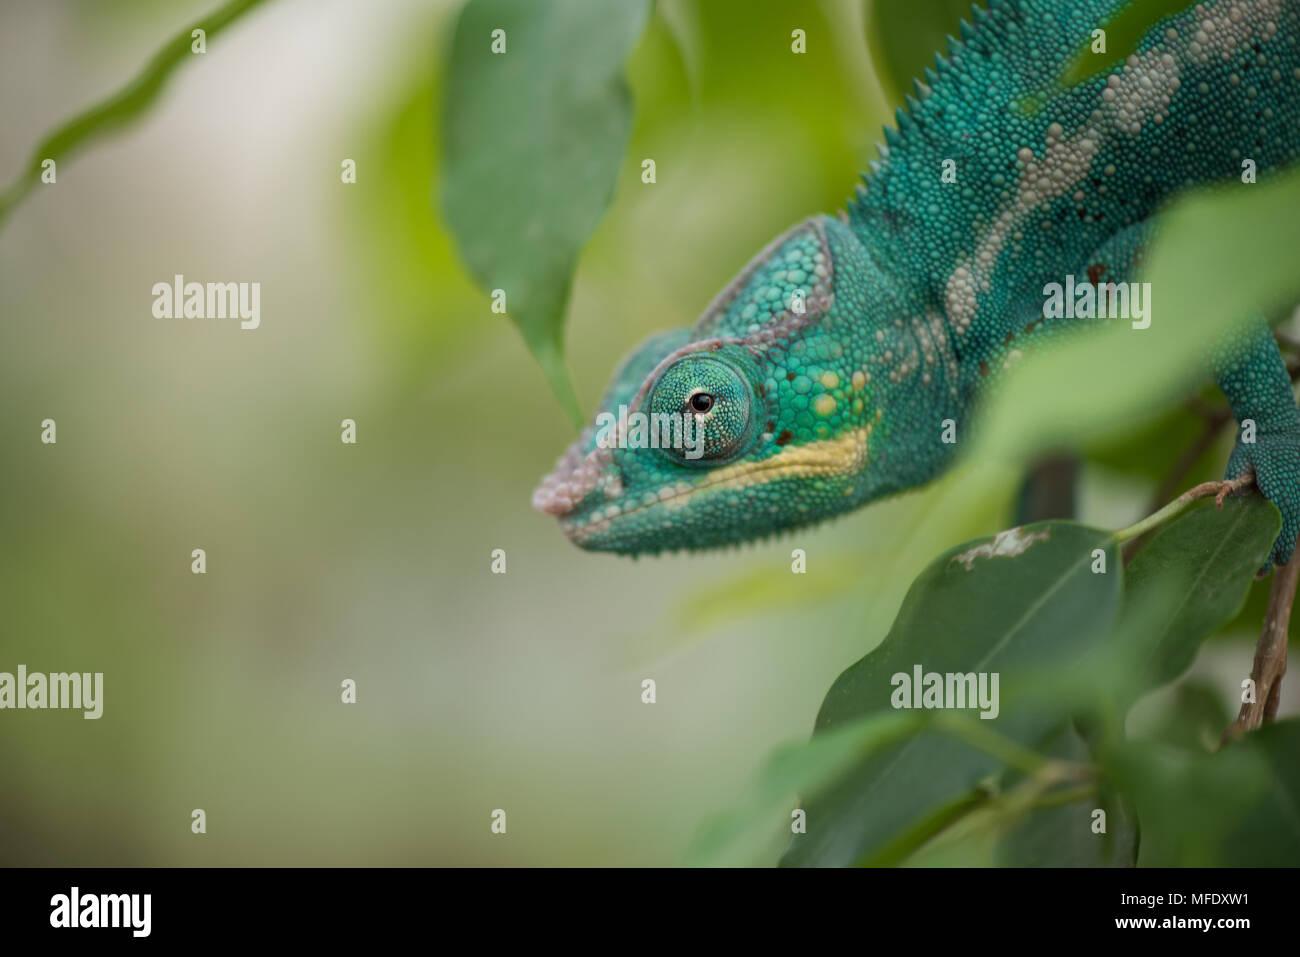 Panther chameleon con colori luminosi / furcifer pardalis / Madagascar wildlife / Nosy be / chameleon in foglie / blue chameleon Immagini Stock